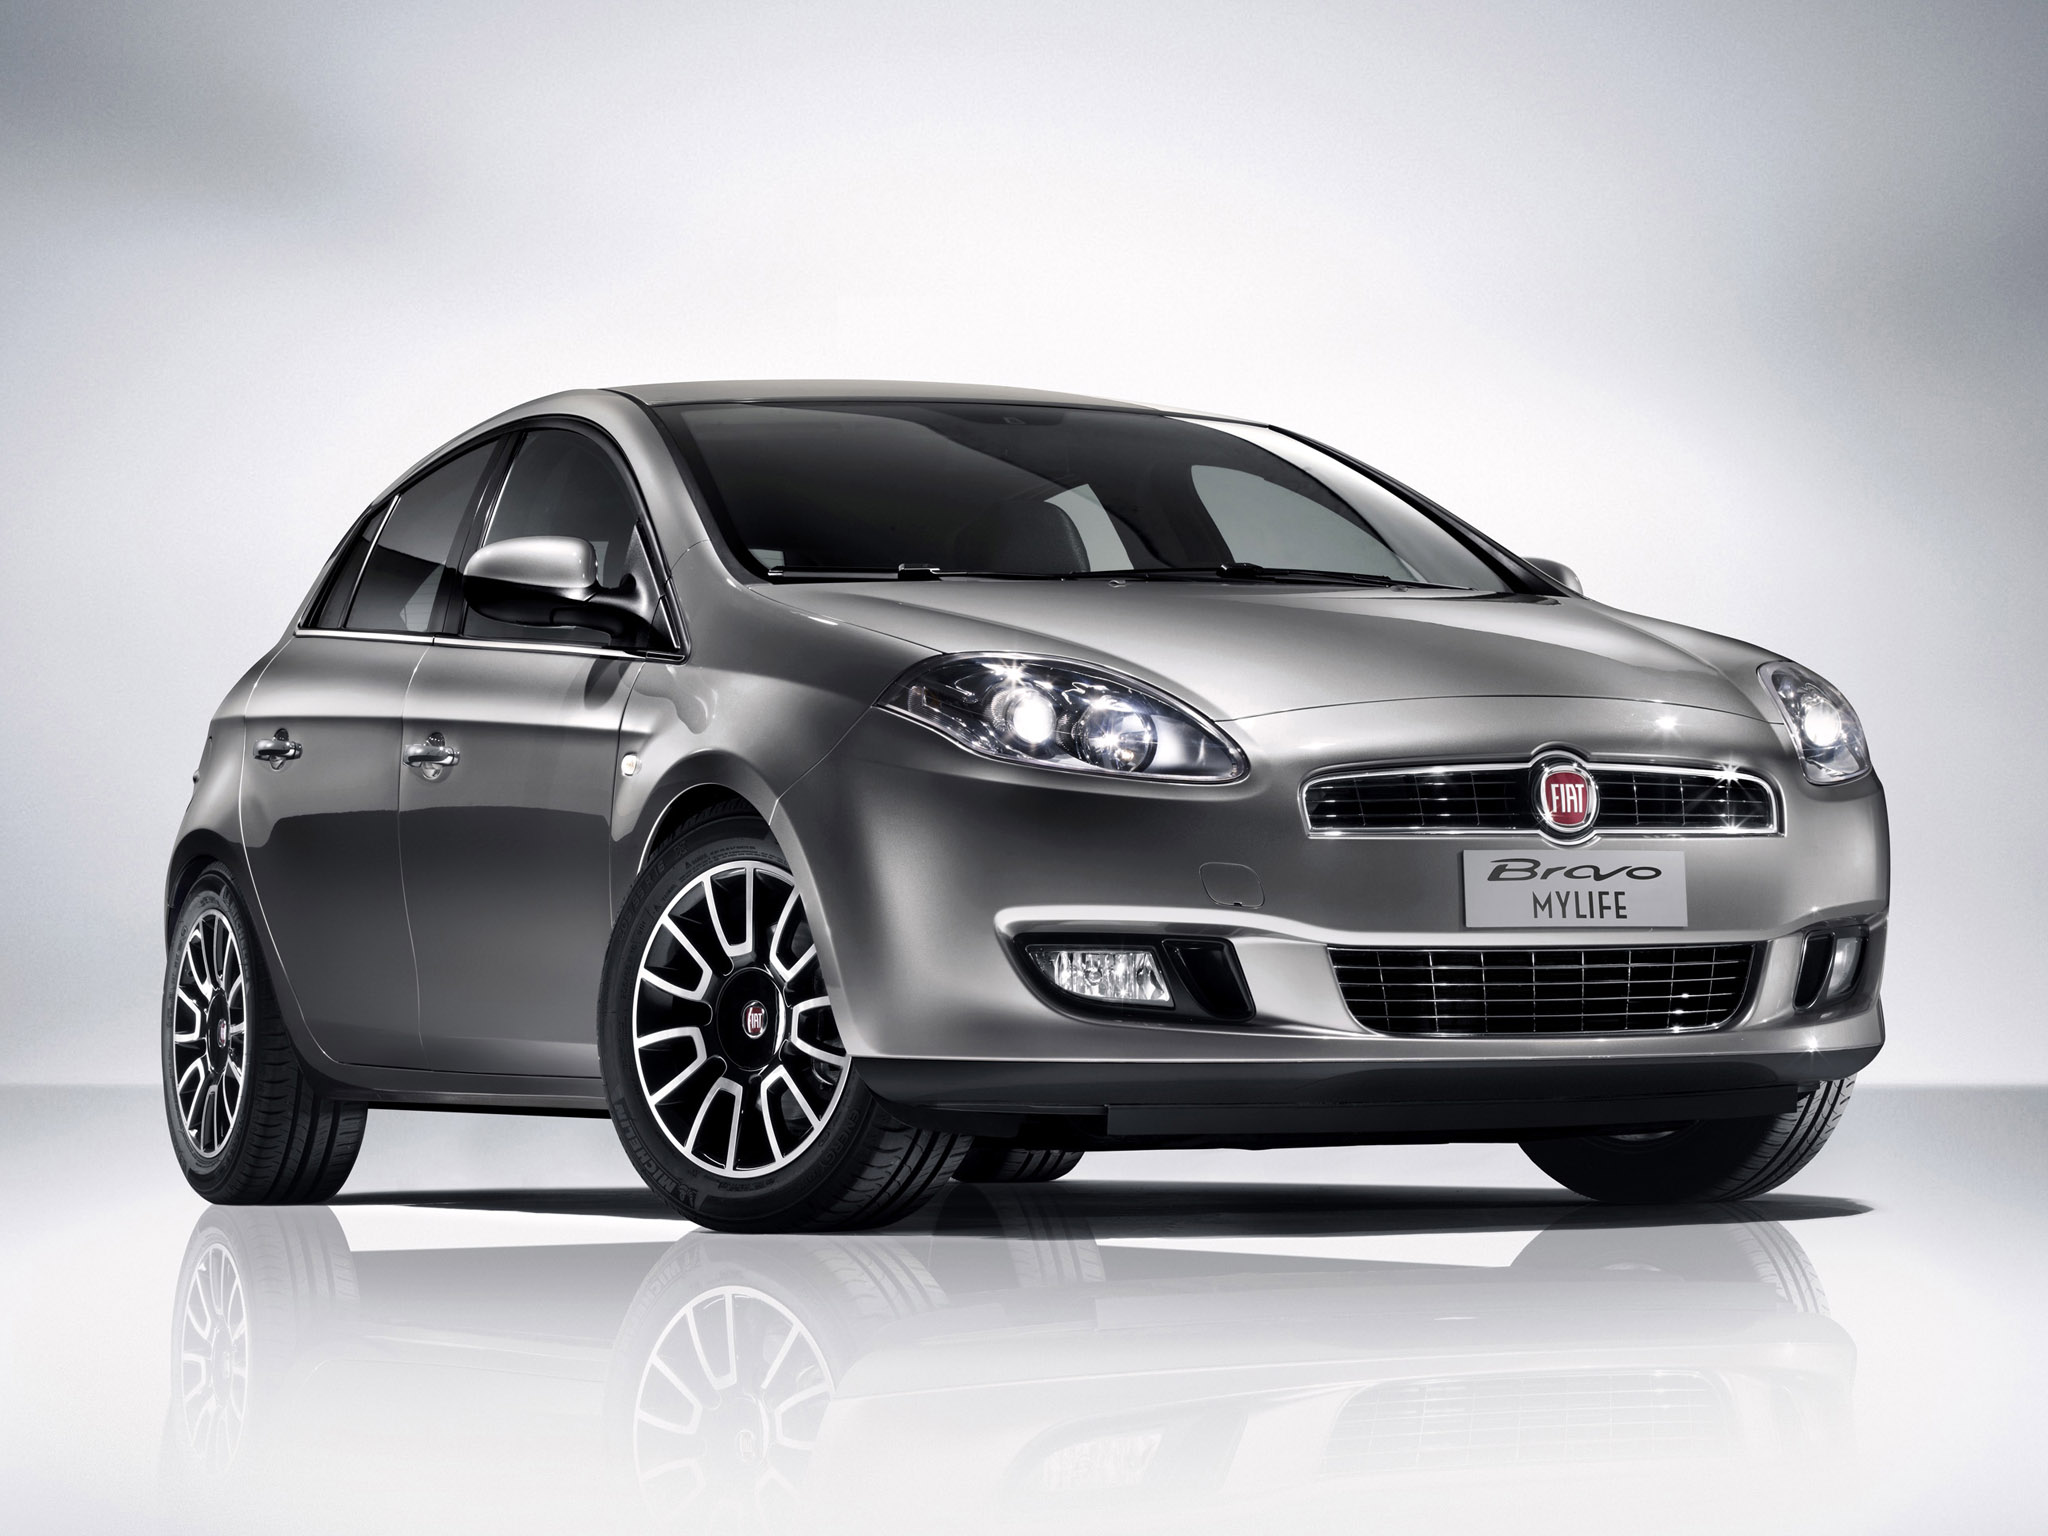 2011 Fiat Bravo My Life